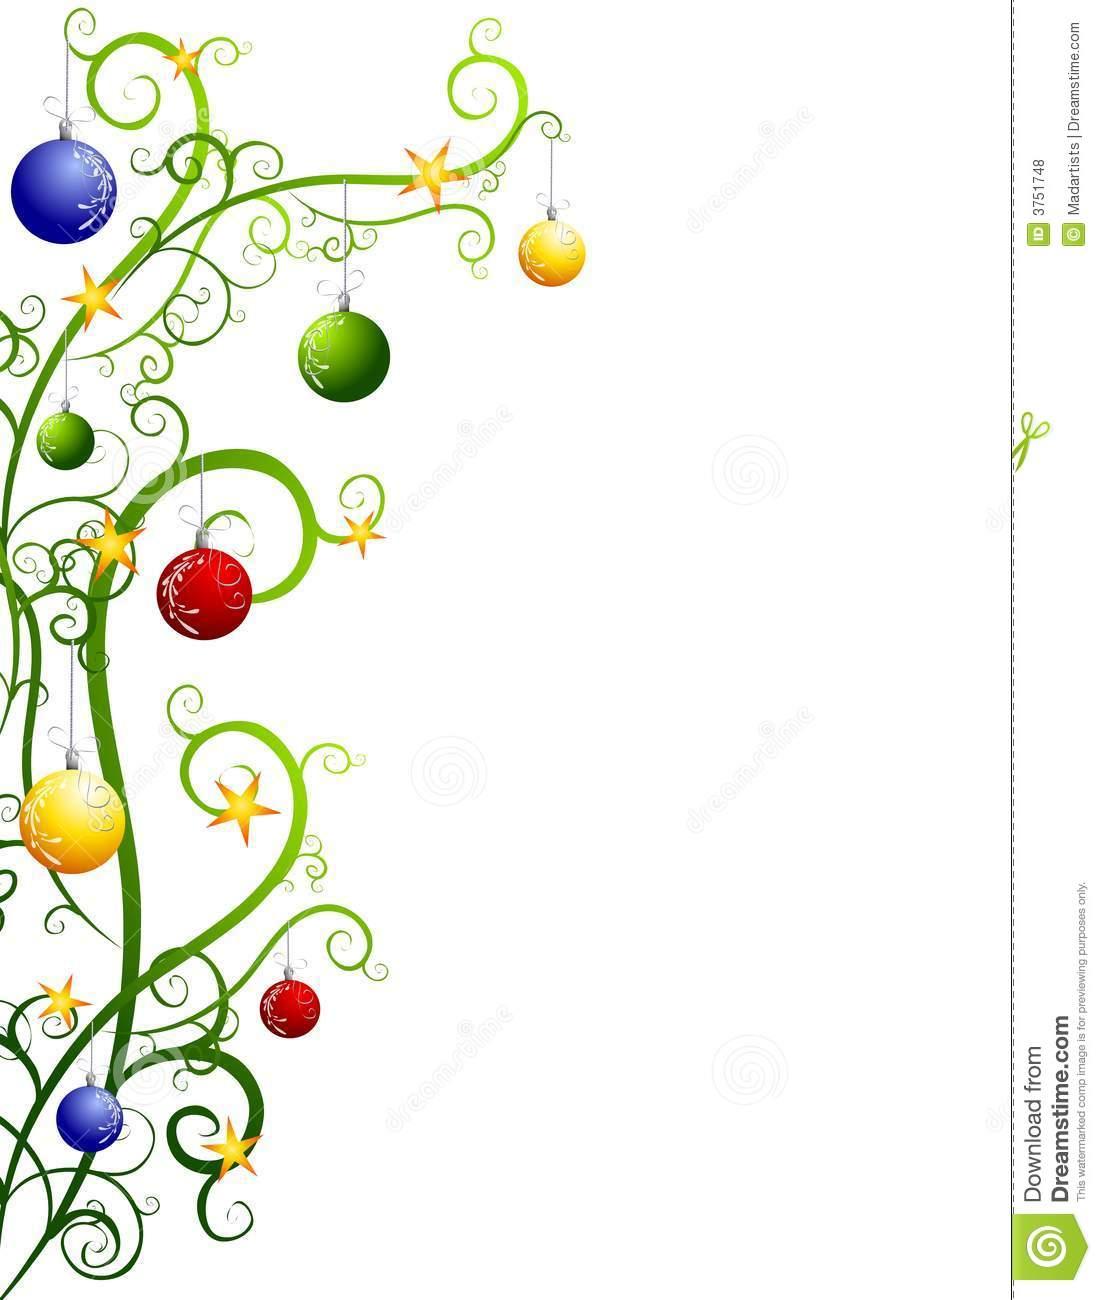 Christmas Page Borders.Christmas Page Borders For Microsoft Word Free Download